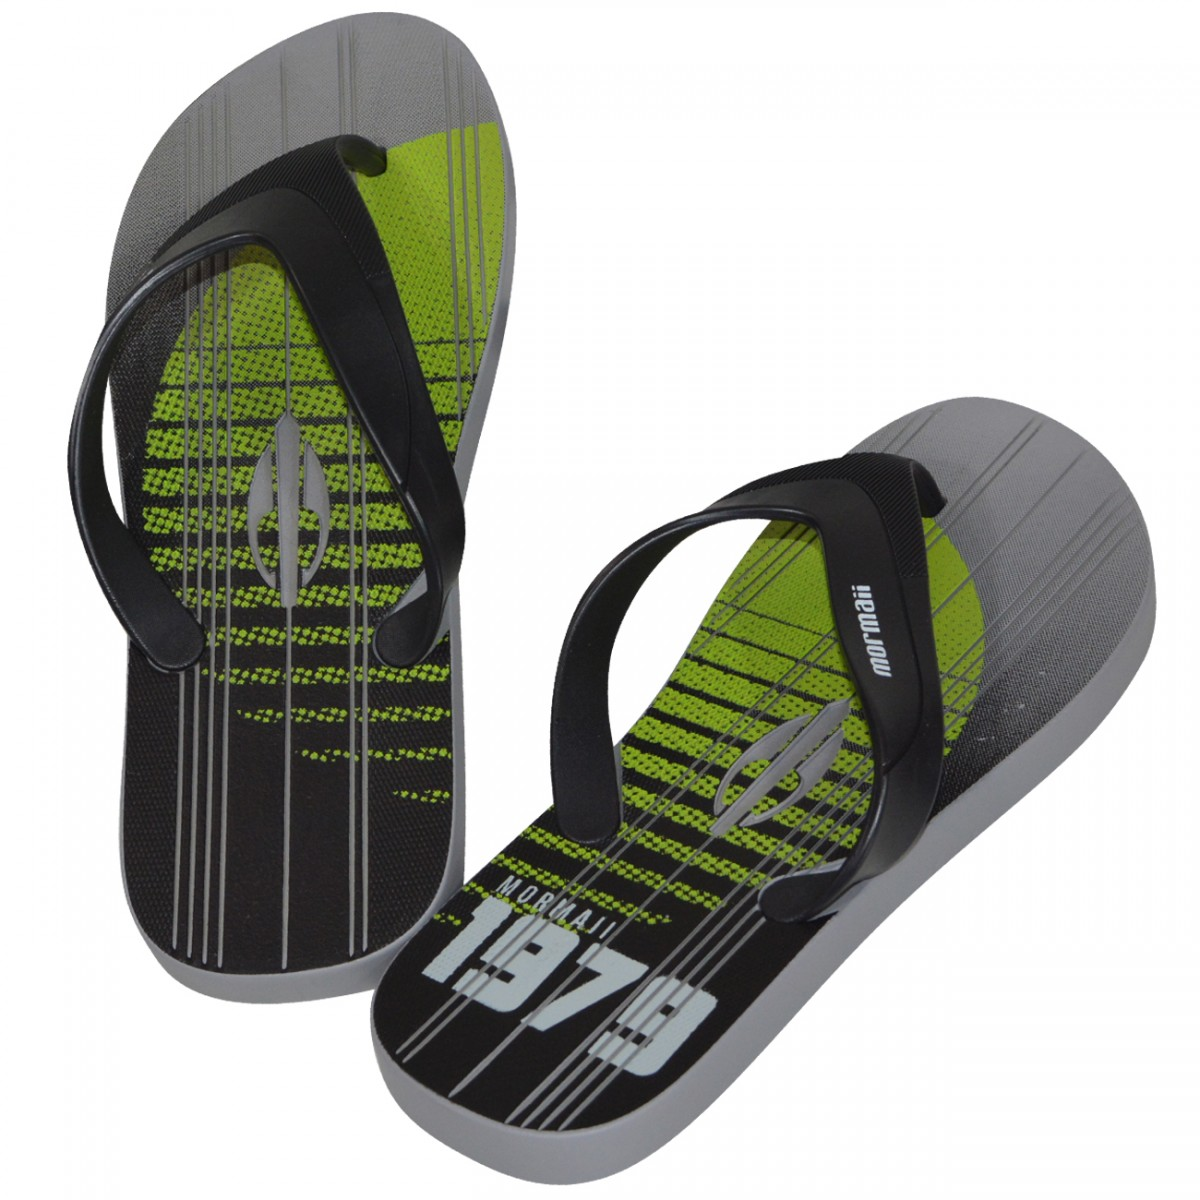 a083bf5bed Chinelo Mormaii Tropical Pro 11060 11060 - 23241 - CINZA PRETO VERDE -  Chuteira Nike